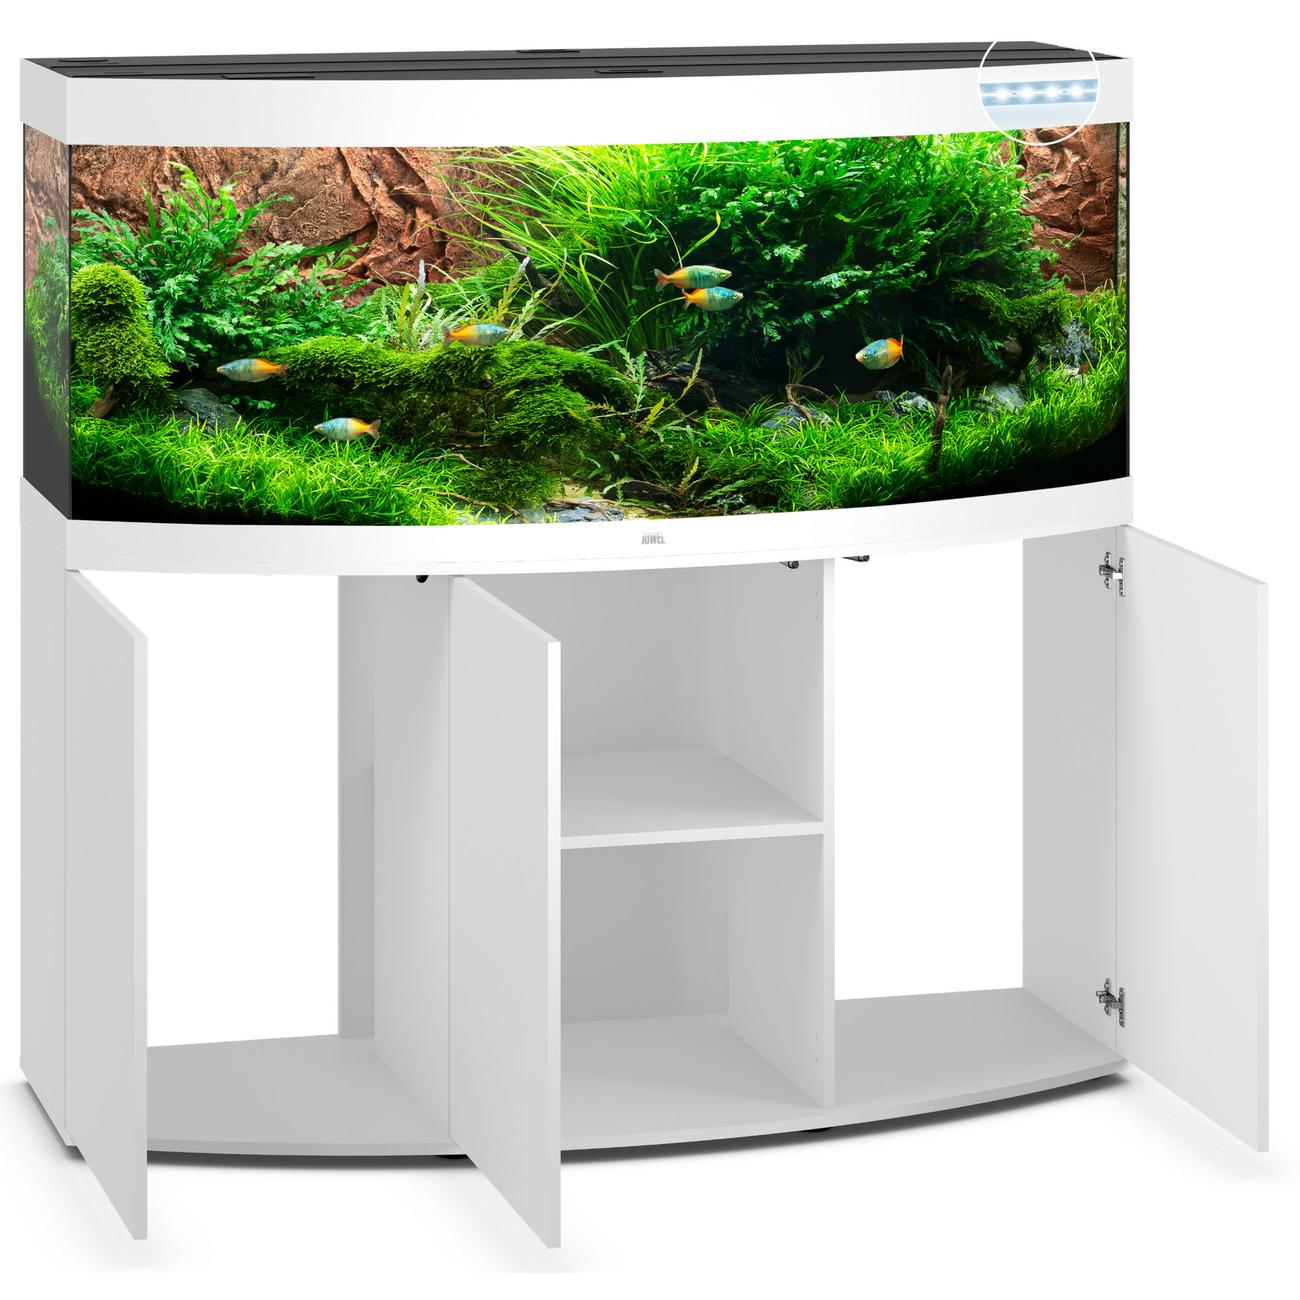 Juwel Vision 450 LED Aquarium mit Unterschrank, Bild 10